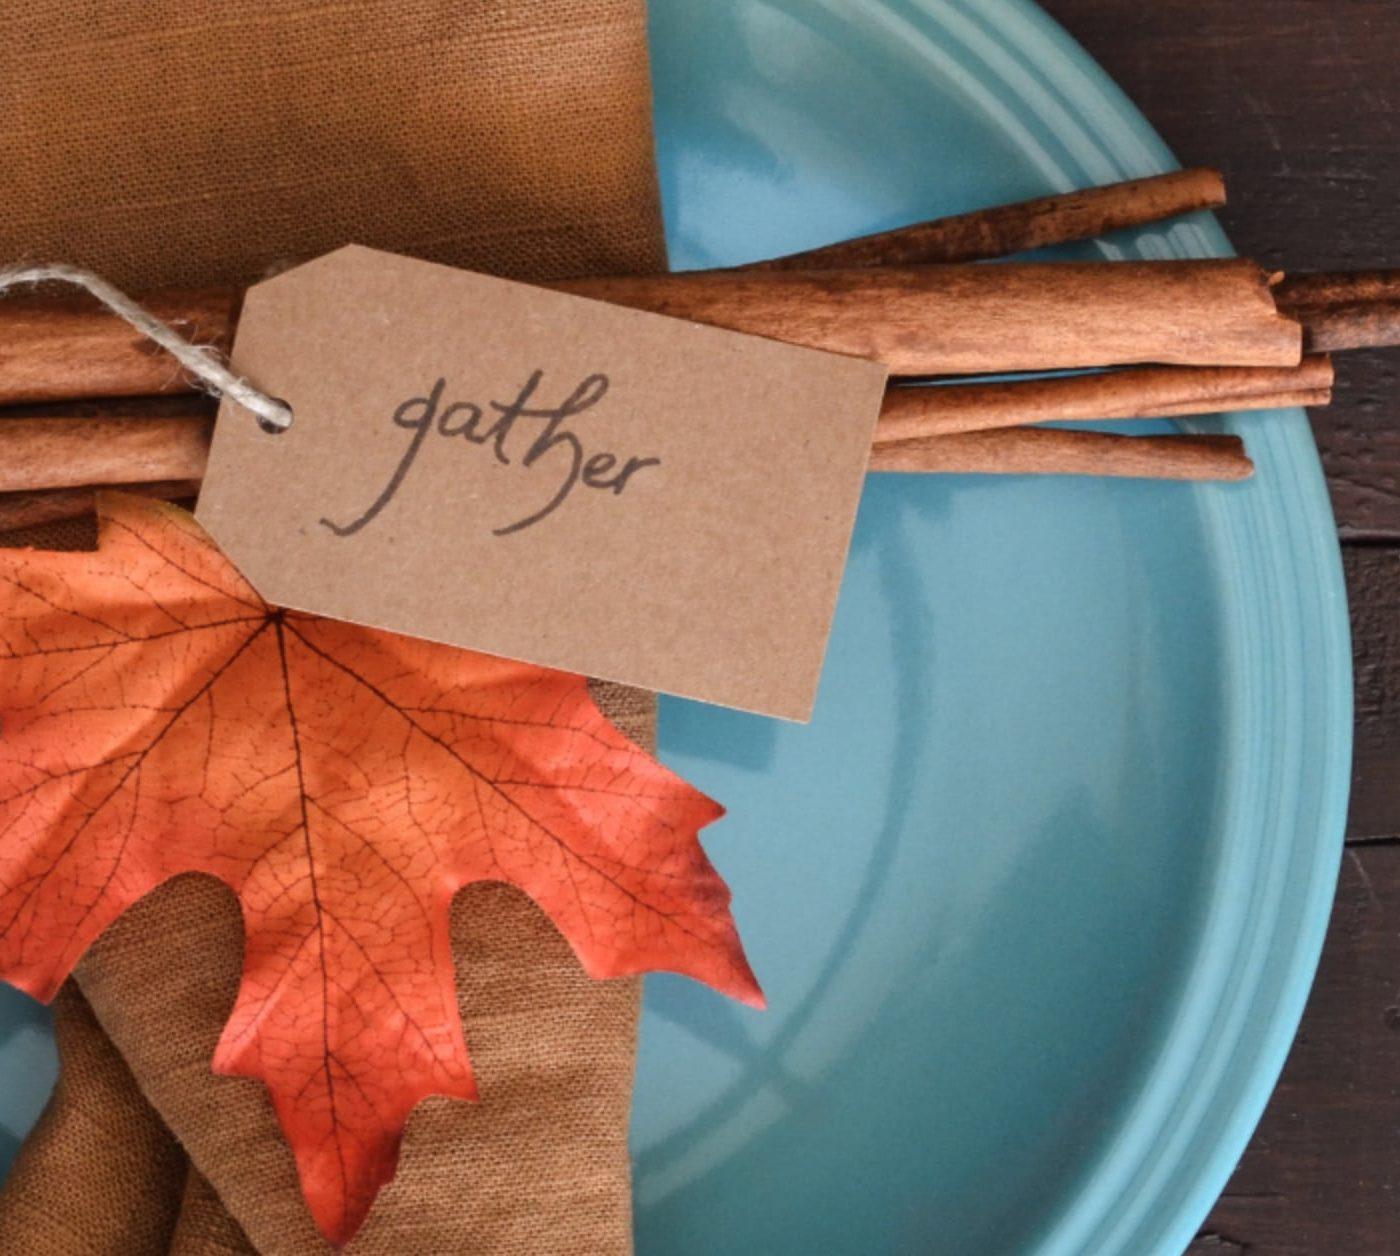 Thanksgiving setting debby-hudson--pkRnhm60ew-unsplash@2x